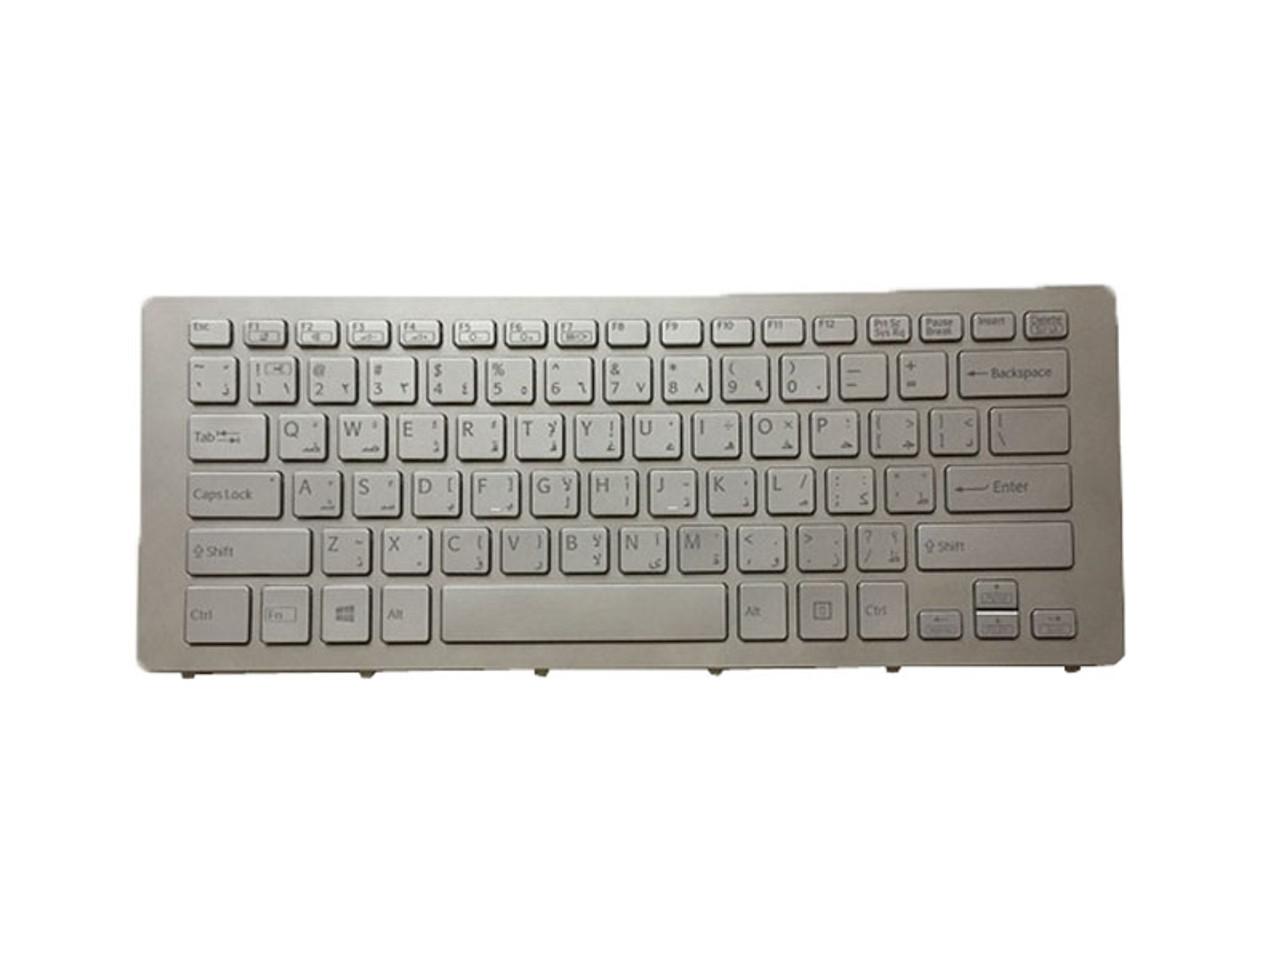 Laptop Keyboard for Sony VAIO SVF15A 9Z.NACSQ.00L 149241591GR AEGD6+000103A Greece GK Black